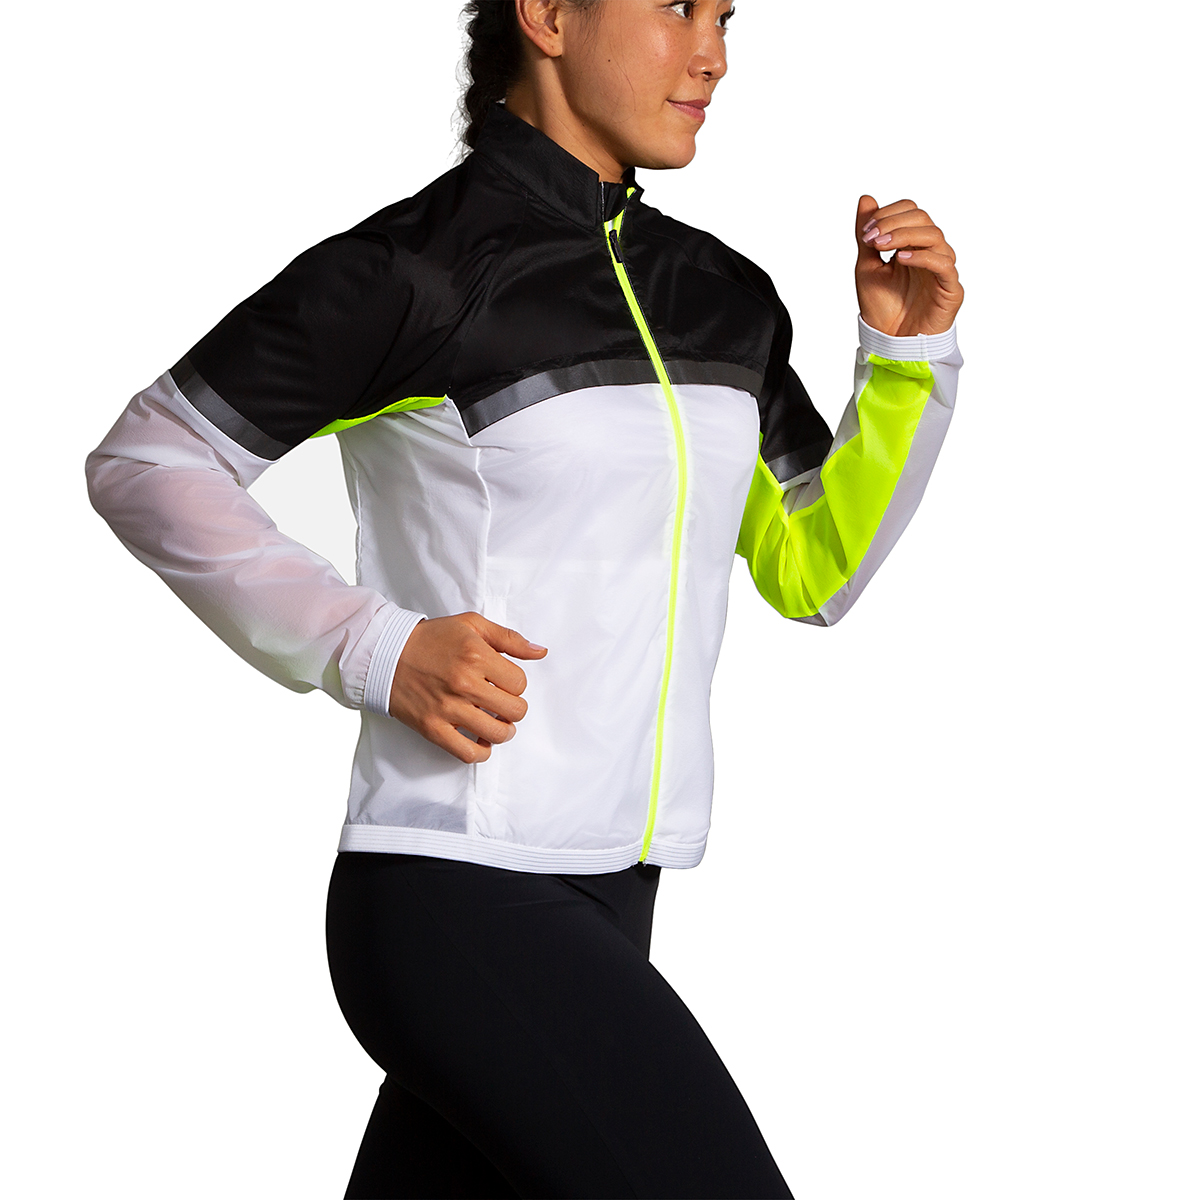 Women's Brooks Run Visible Carbonite Jacket  - Color: Luminosity - Size: XS, Luminosity, large, image 2